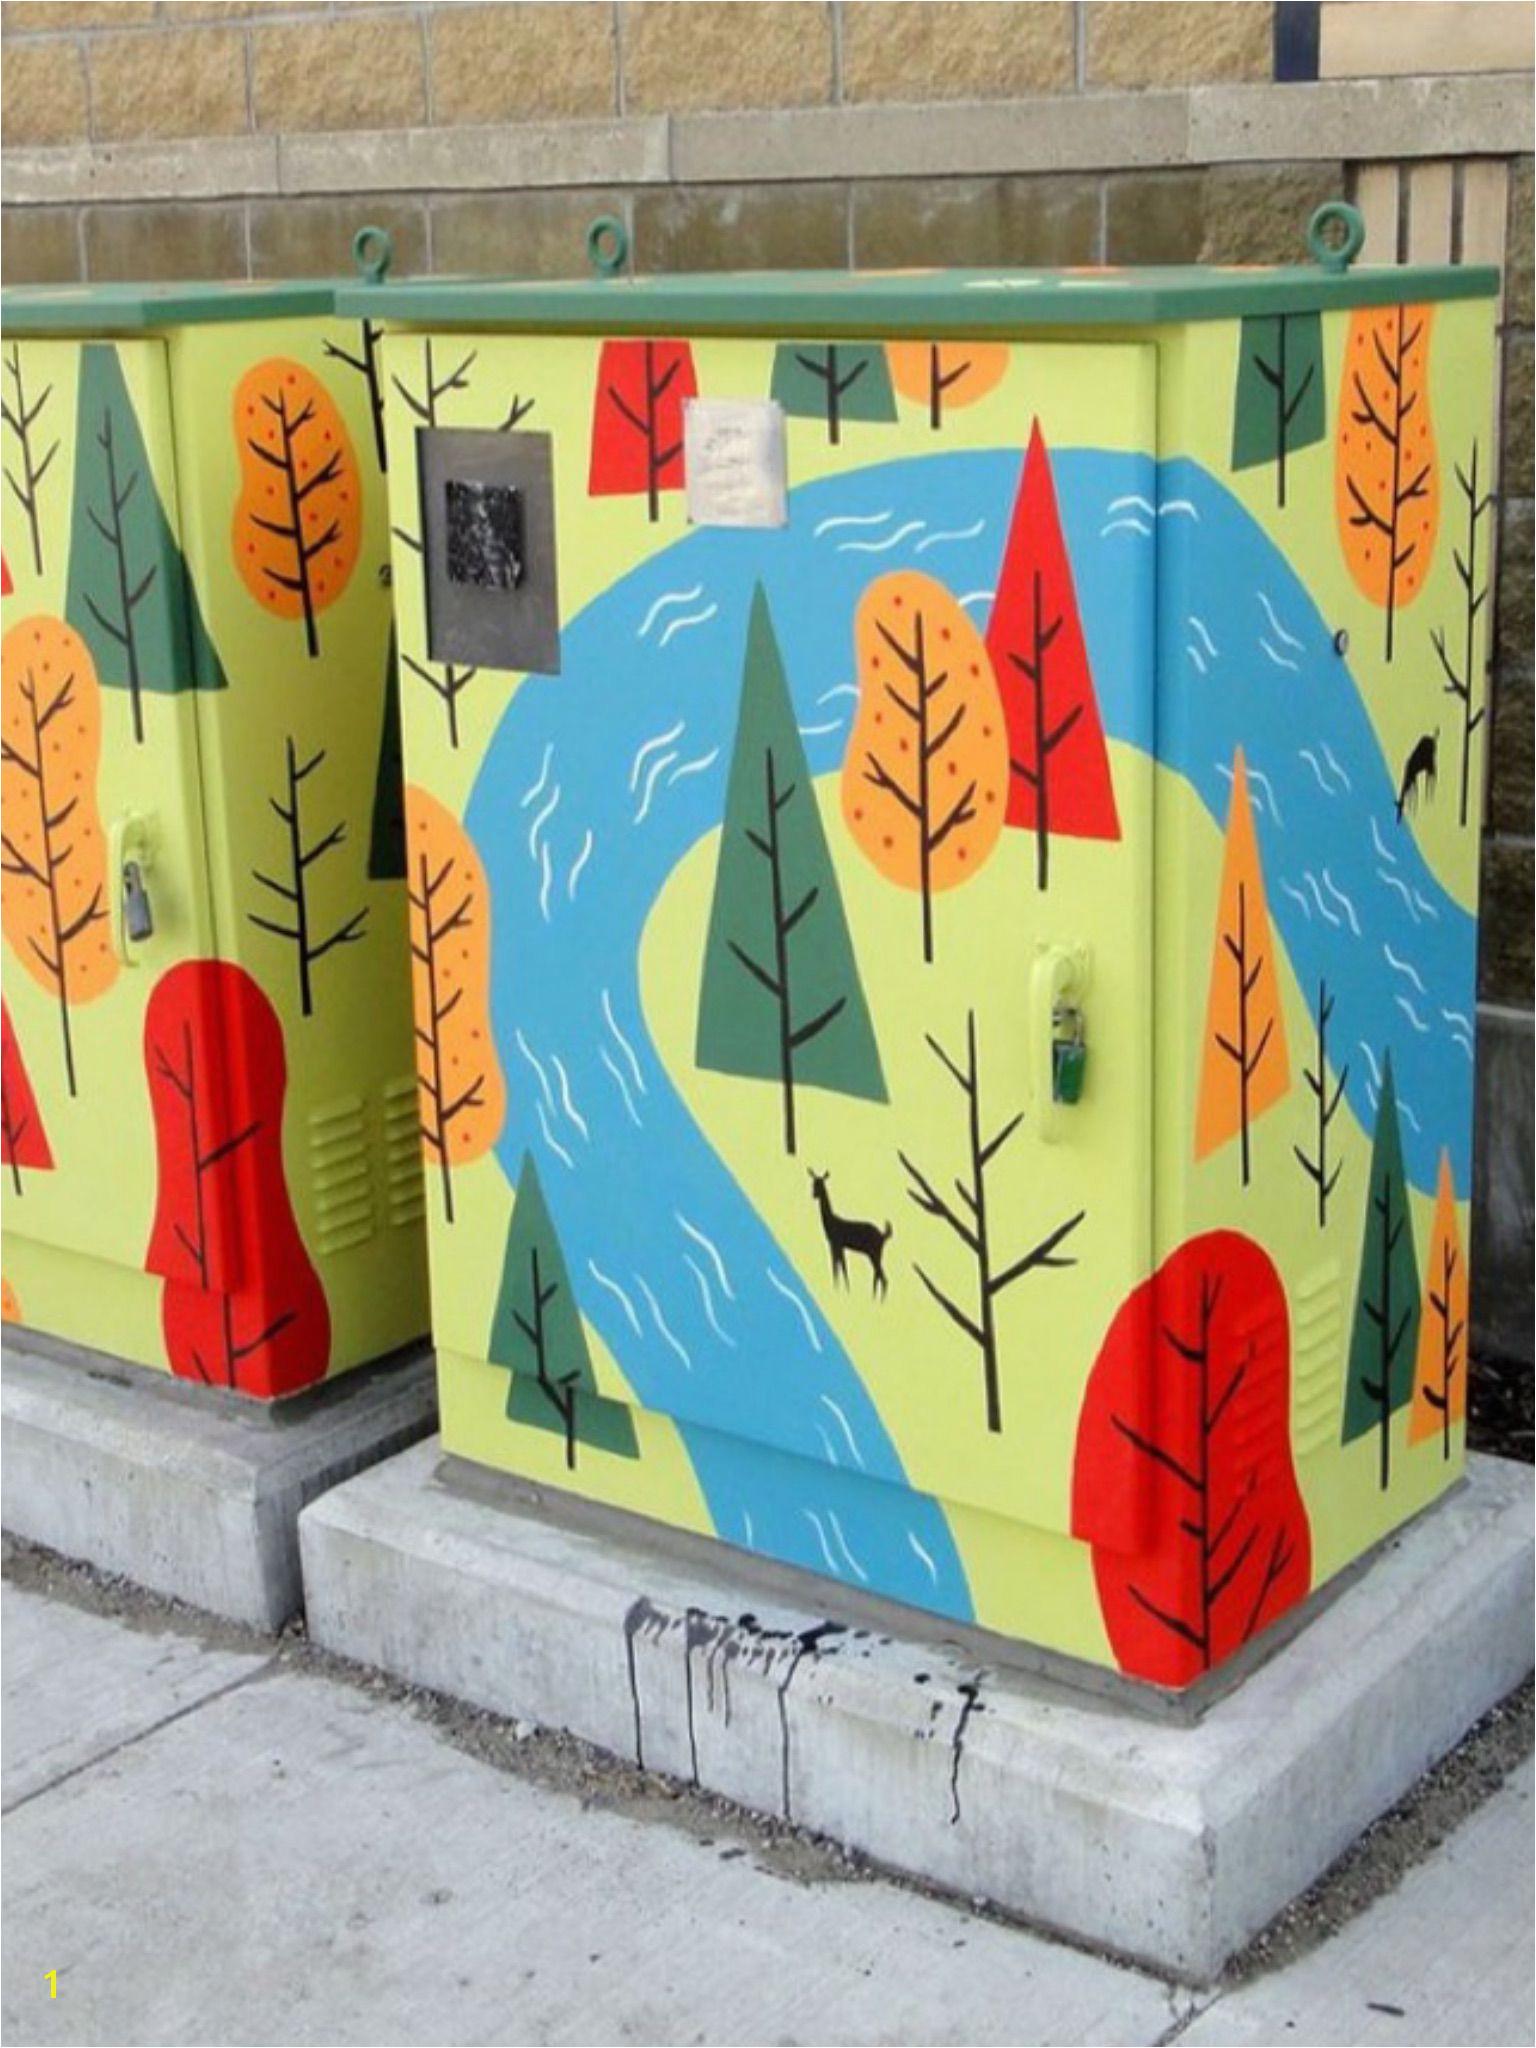 Urban Street Art Urban Art Electric Box Art Programs Painted Boxes